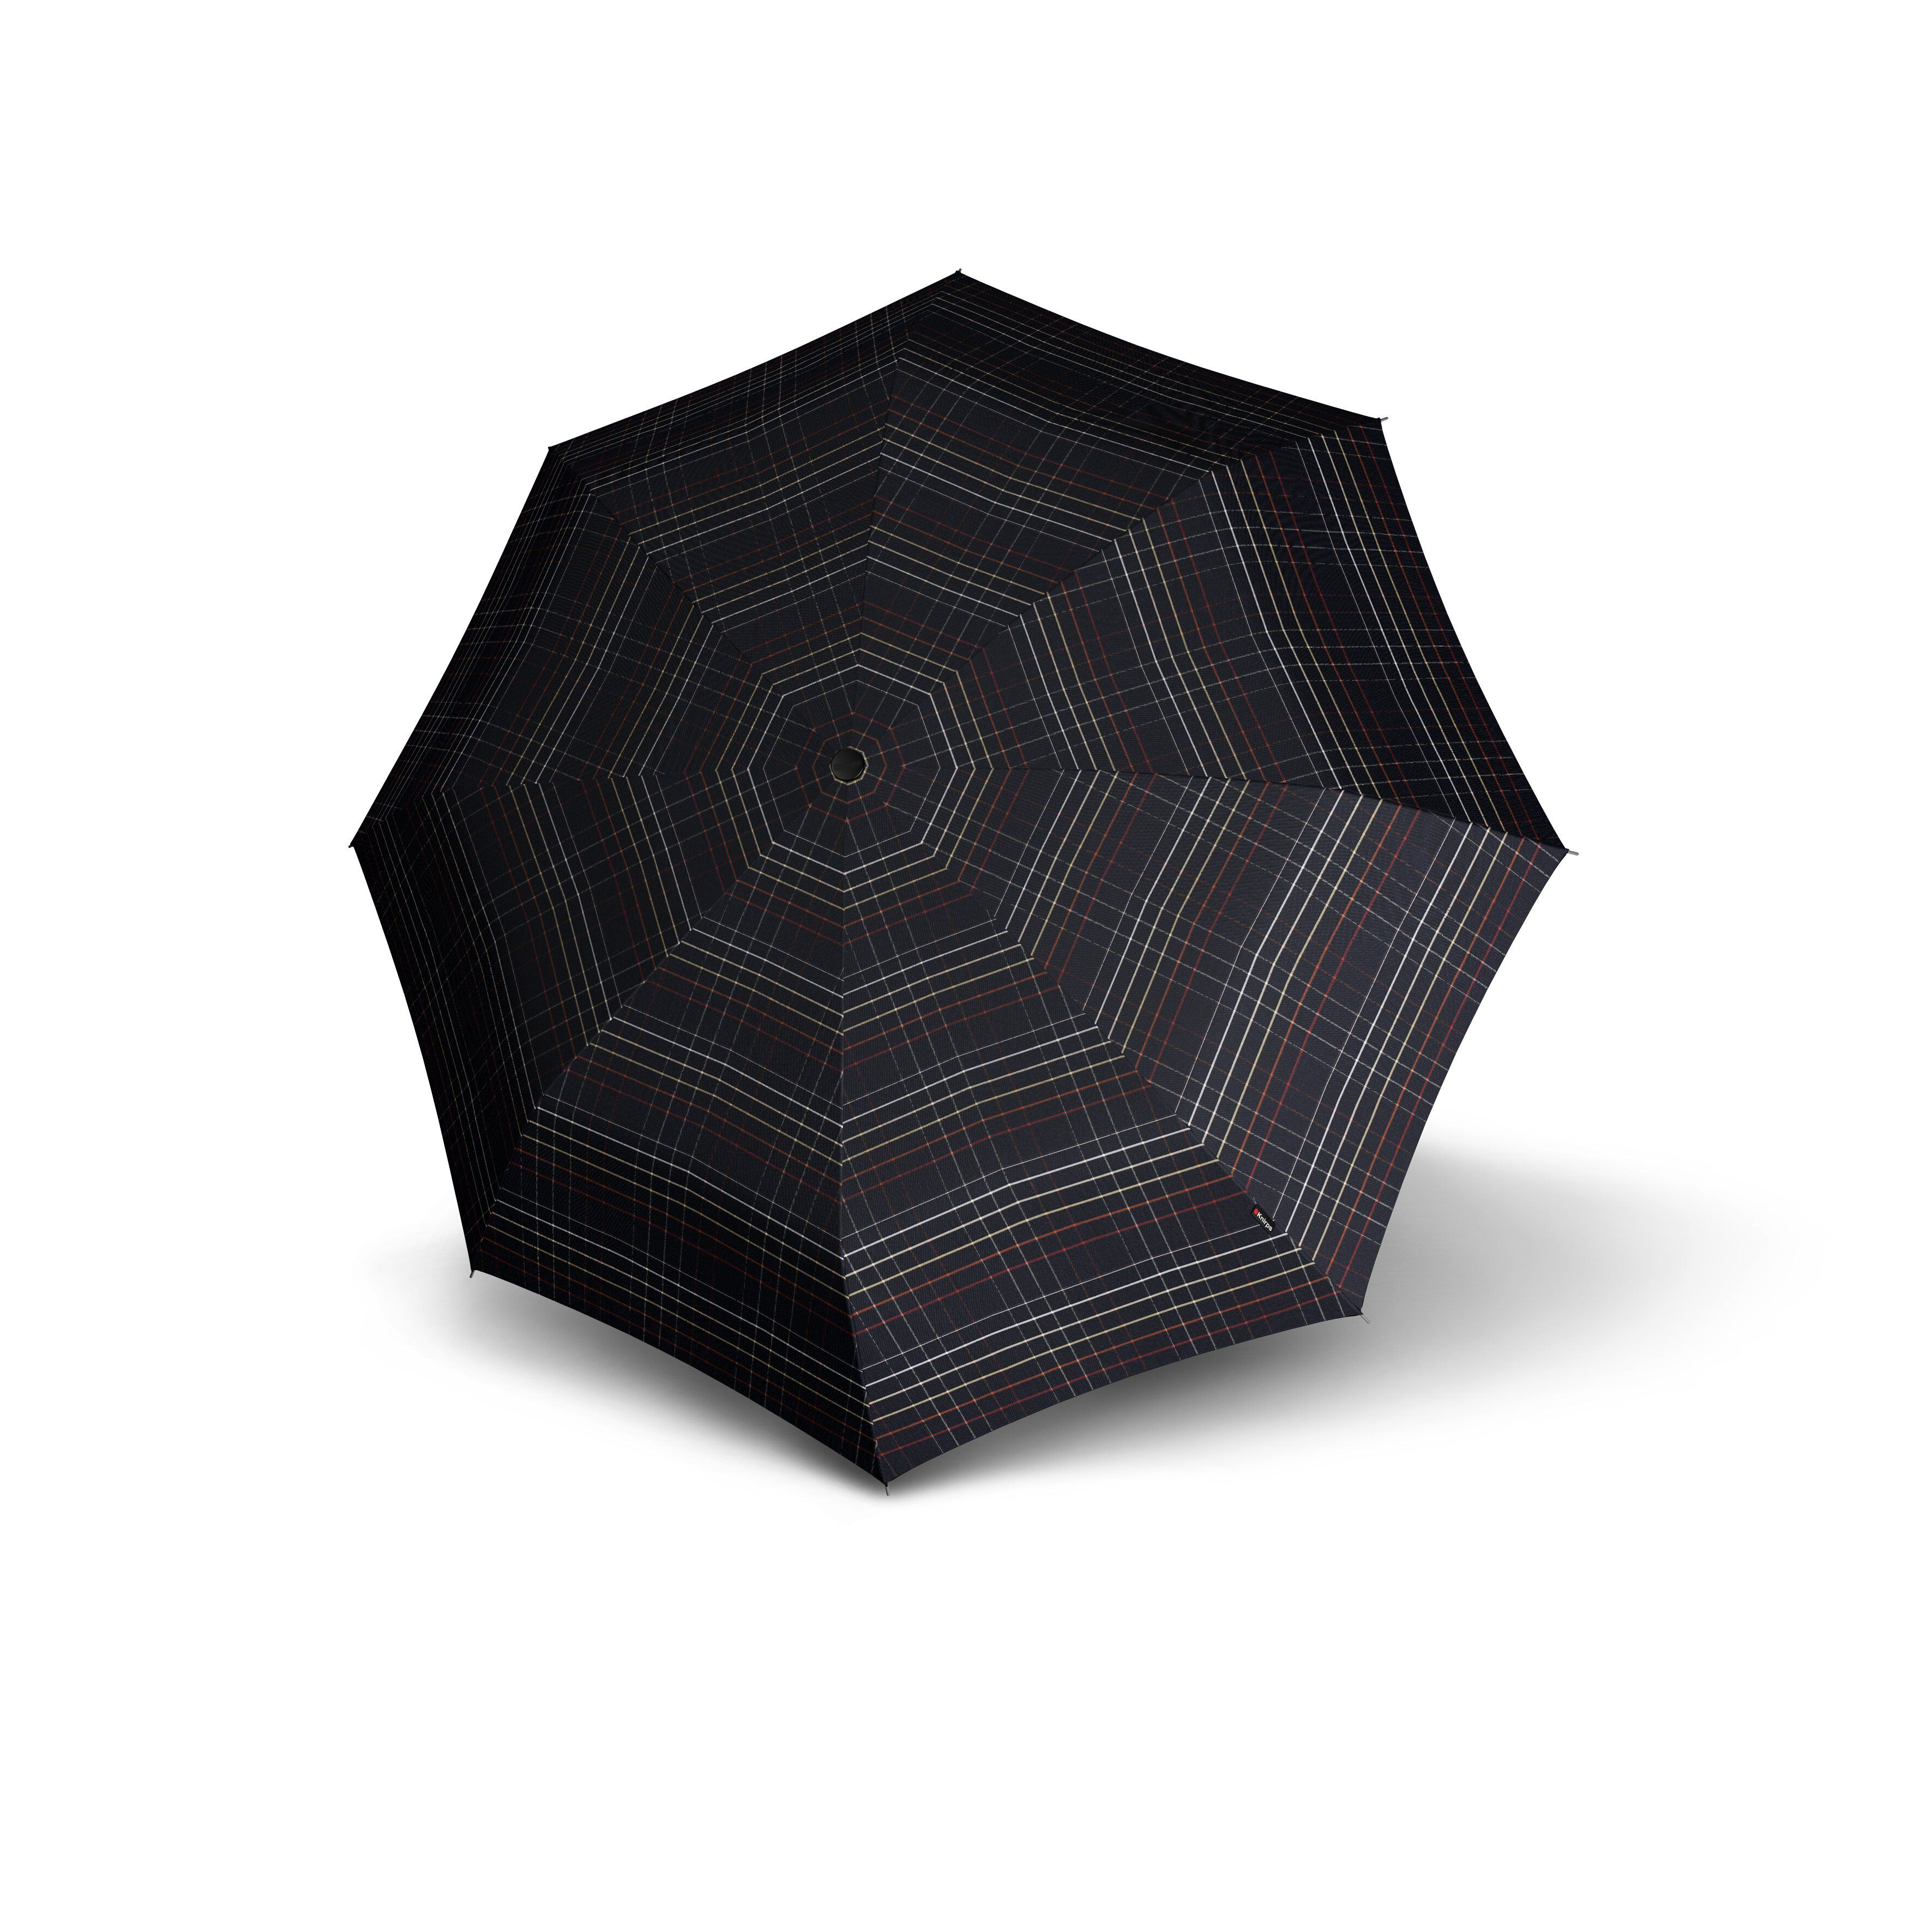 Knirps Umbrella S.570 large automatic - photo 2